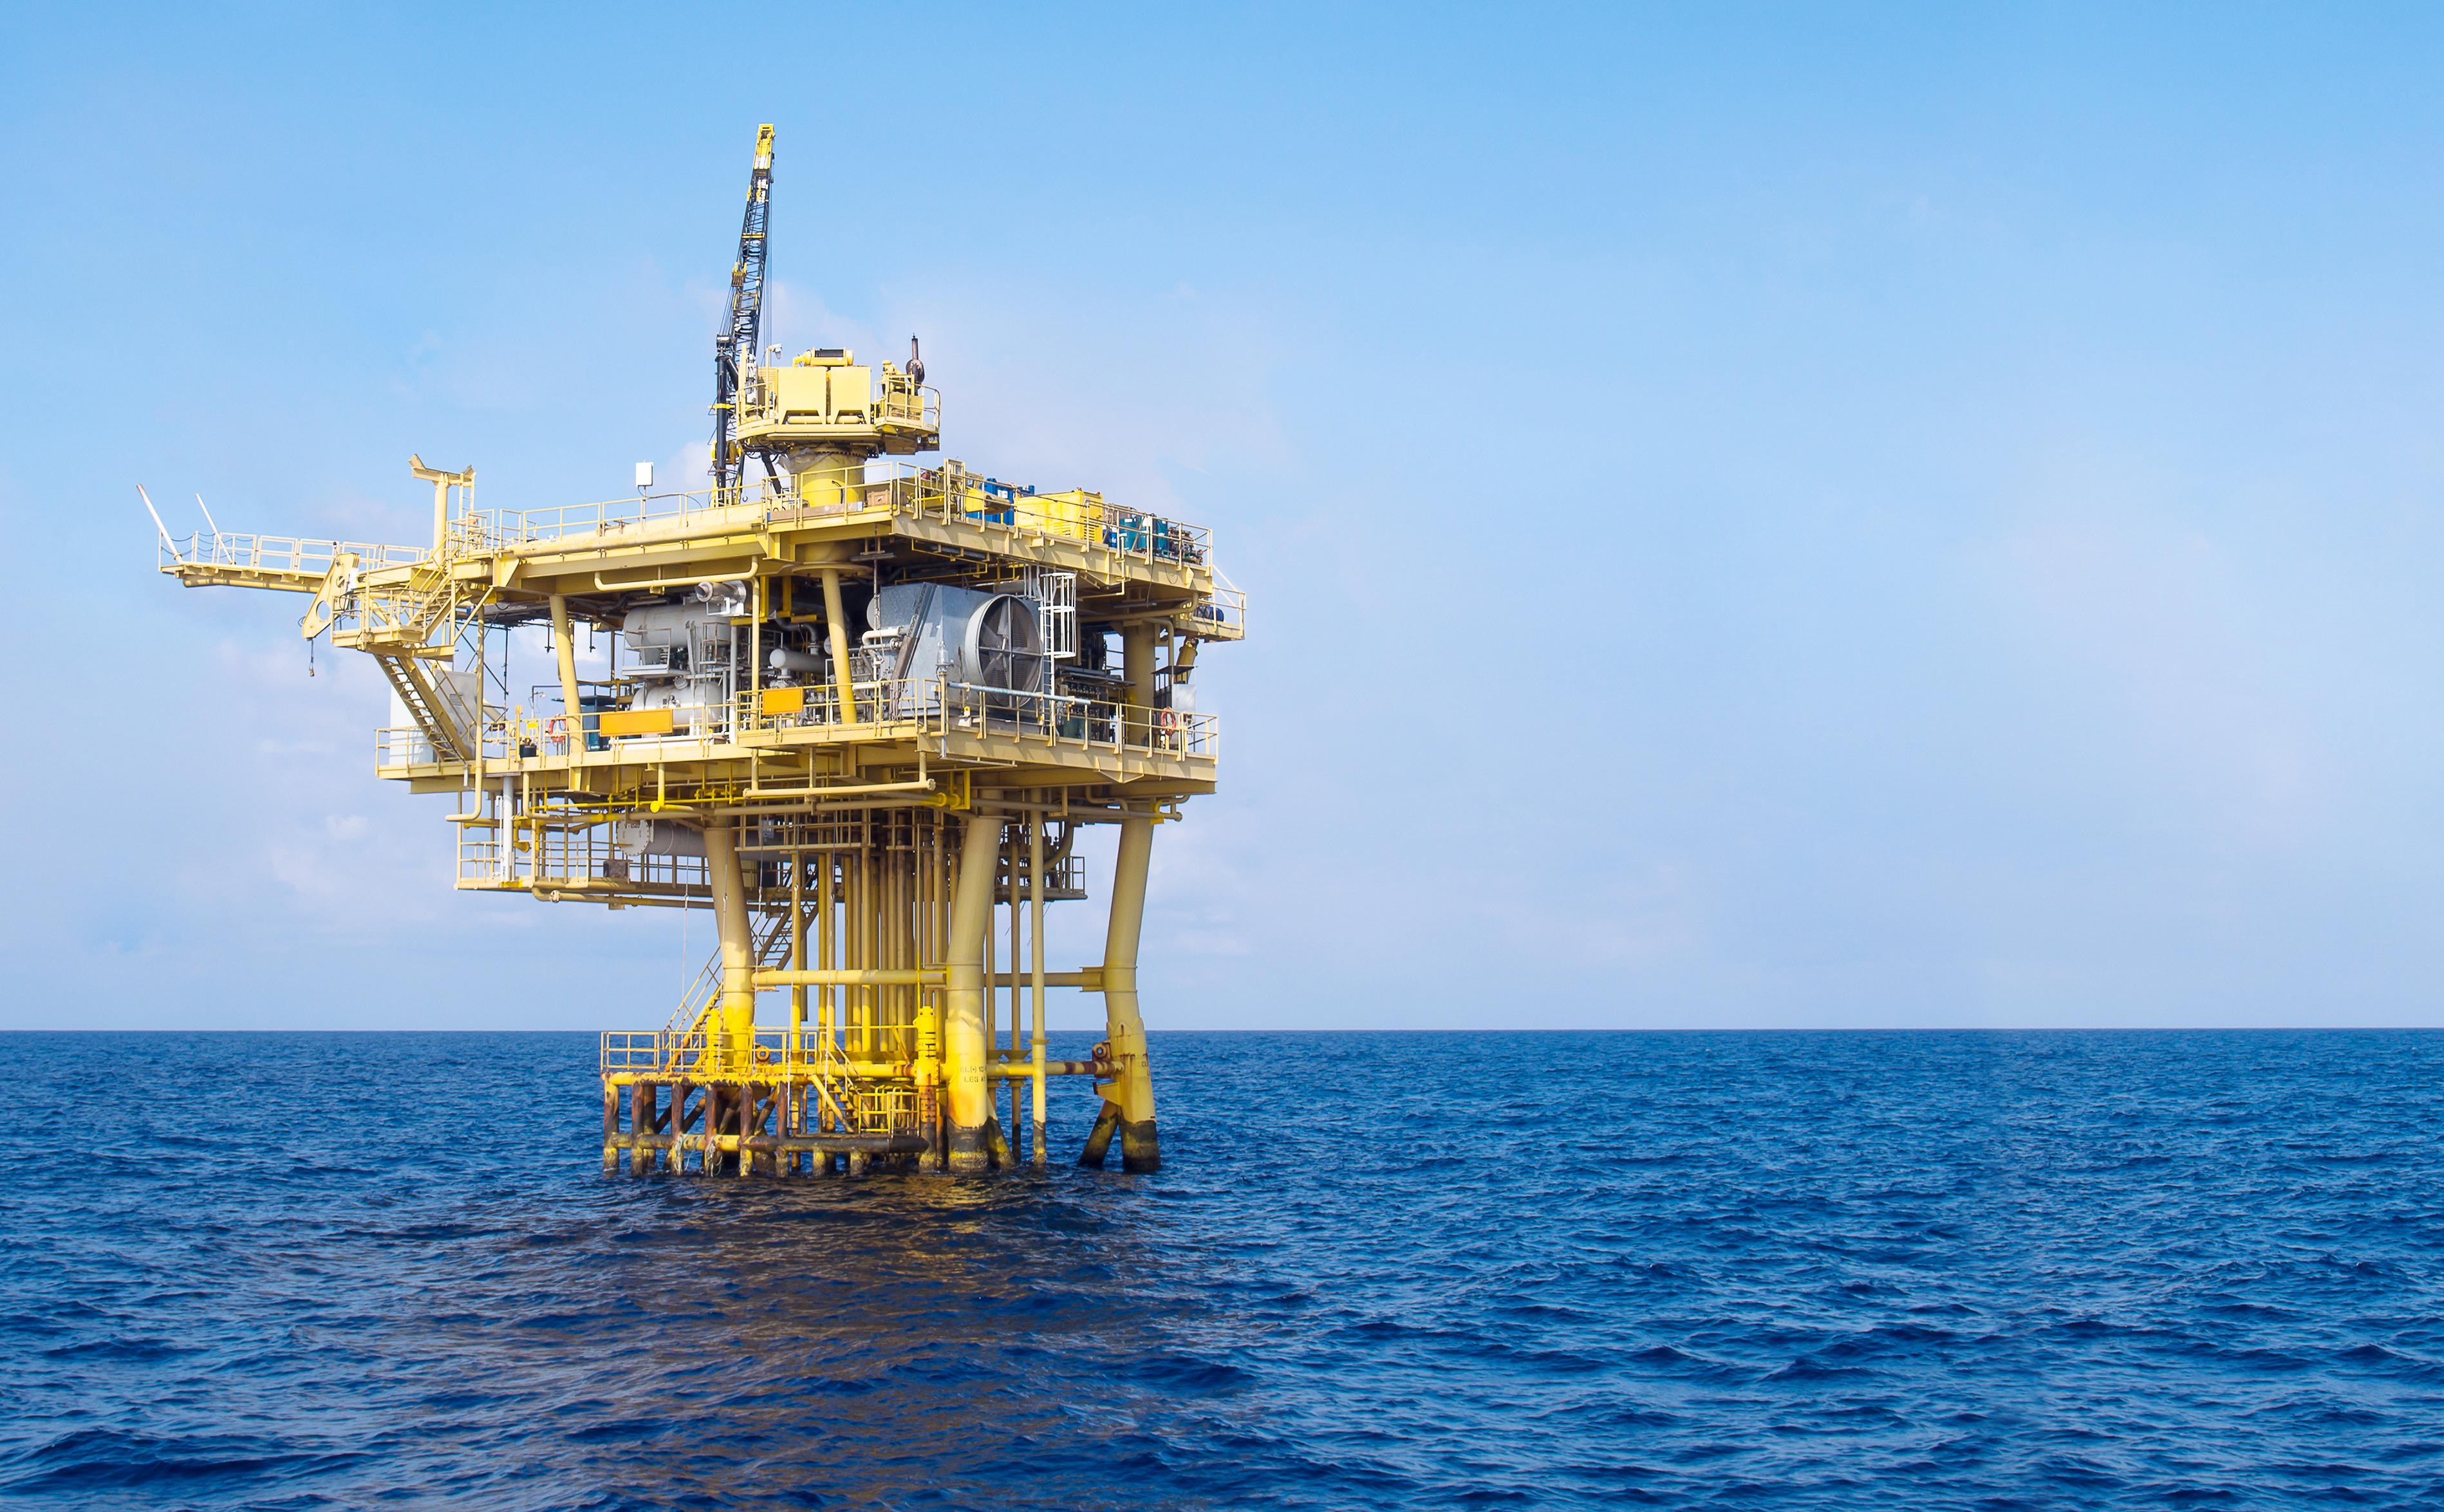 essay oil company southampton  essay oil company southampton prisma company